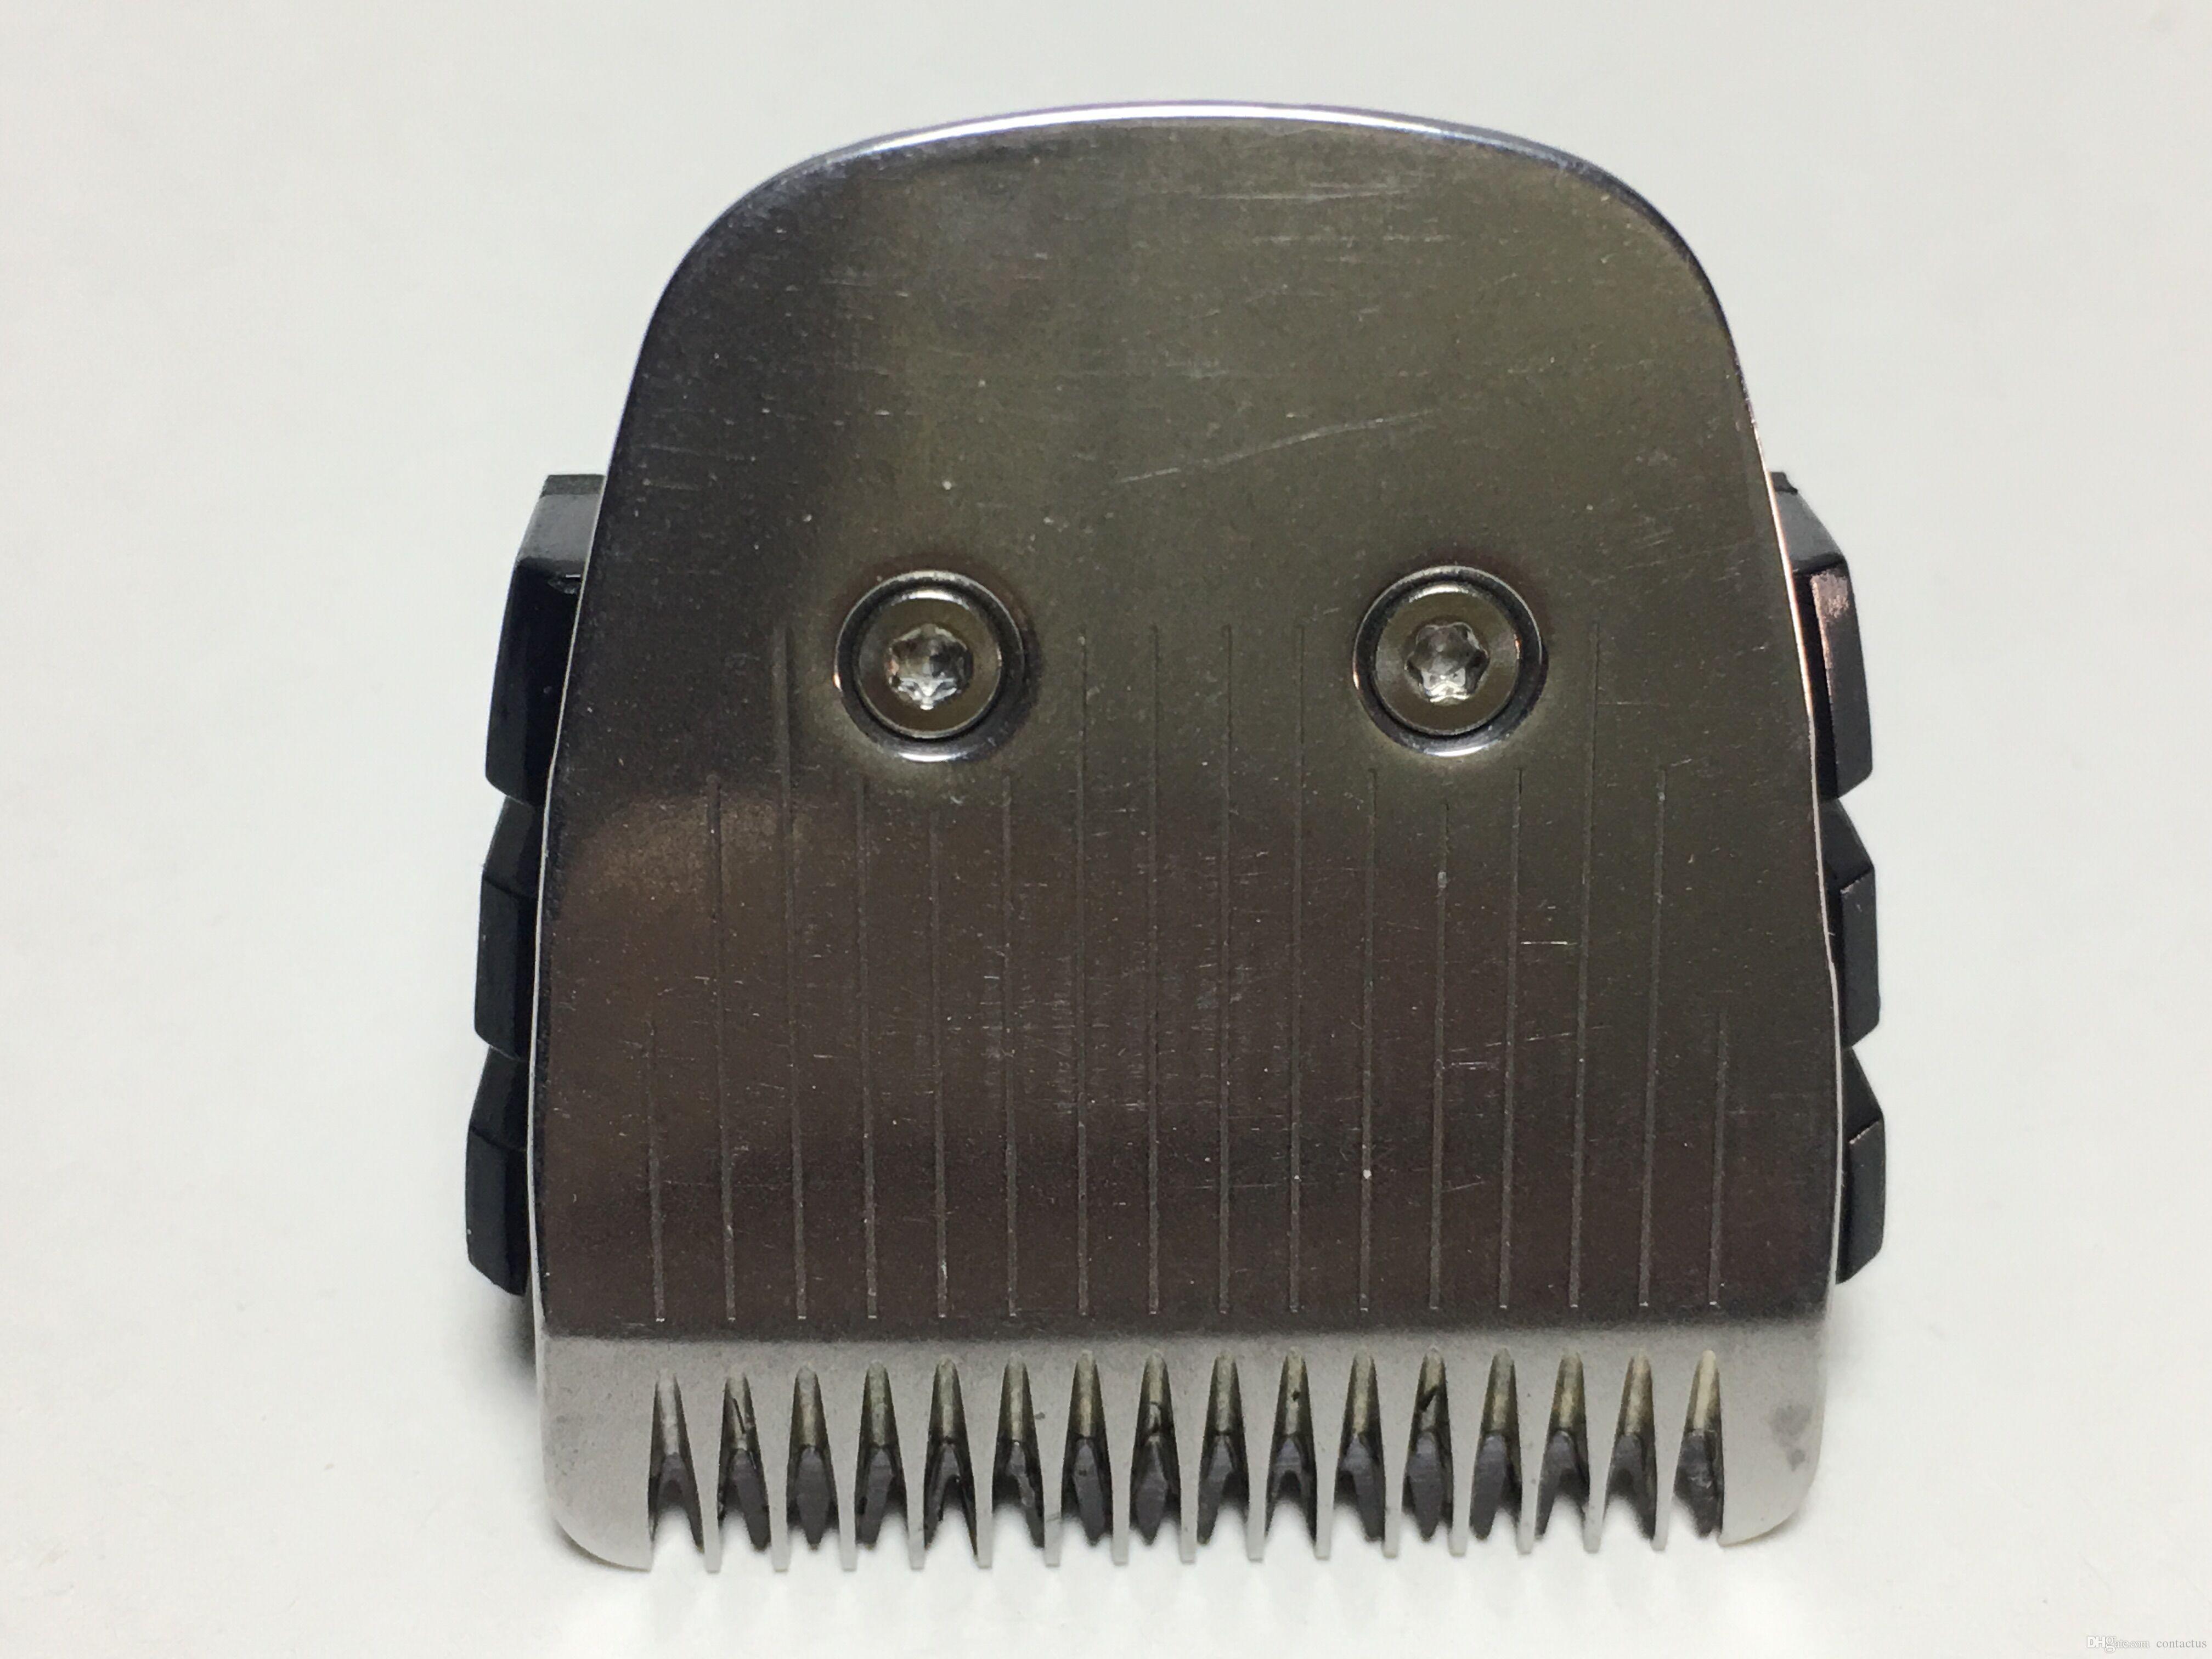 New Hair Clipper Cutter Blades For PHILIPS BT7203 BT7203/13 BT7203/15 BT7203/16 BT7204 BT7204/13 BT7204/15 BT7204/16 BT7204/85 Replacement